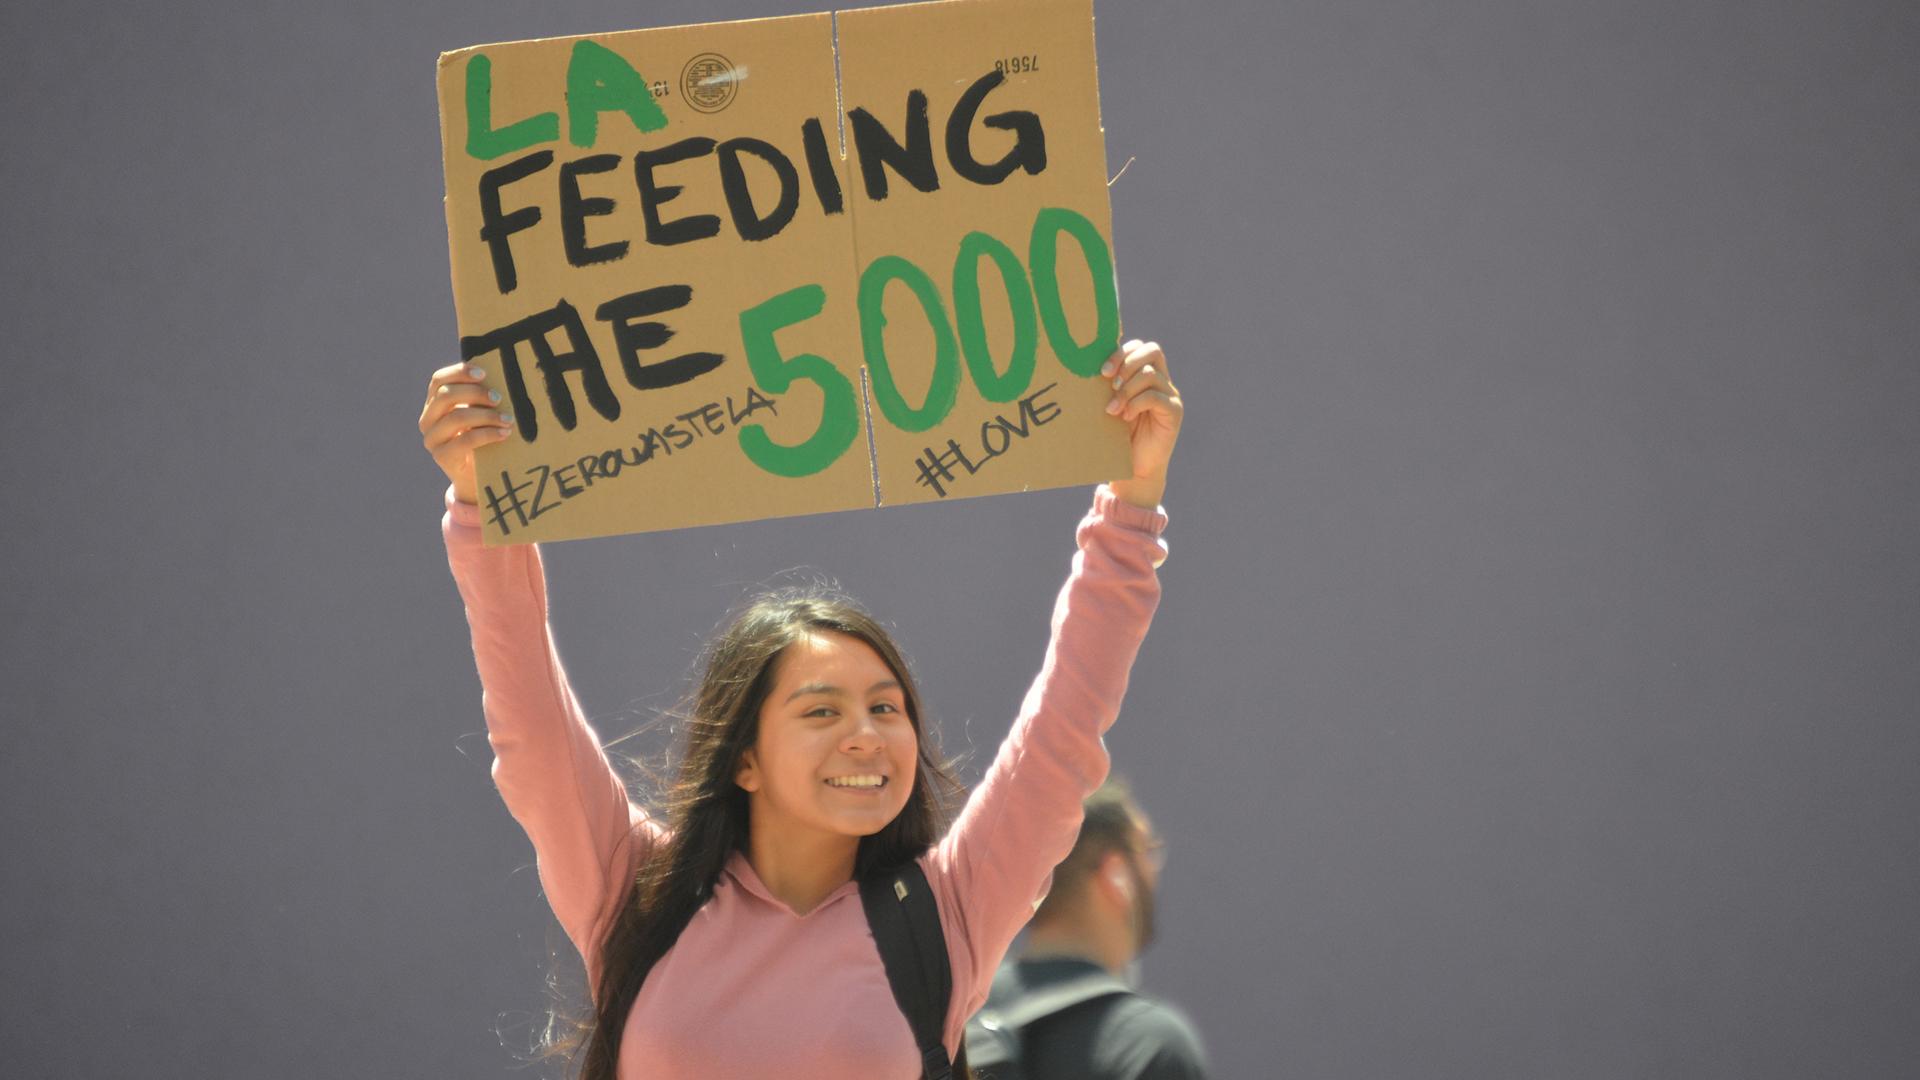 LA Feeding The 500